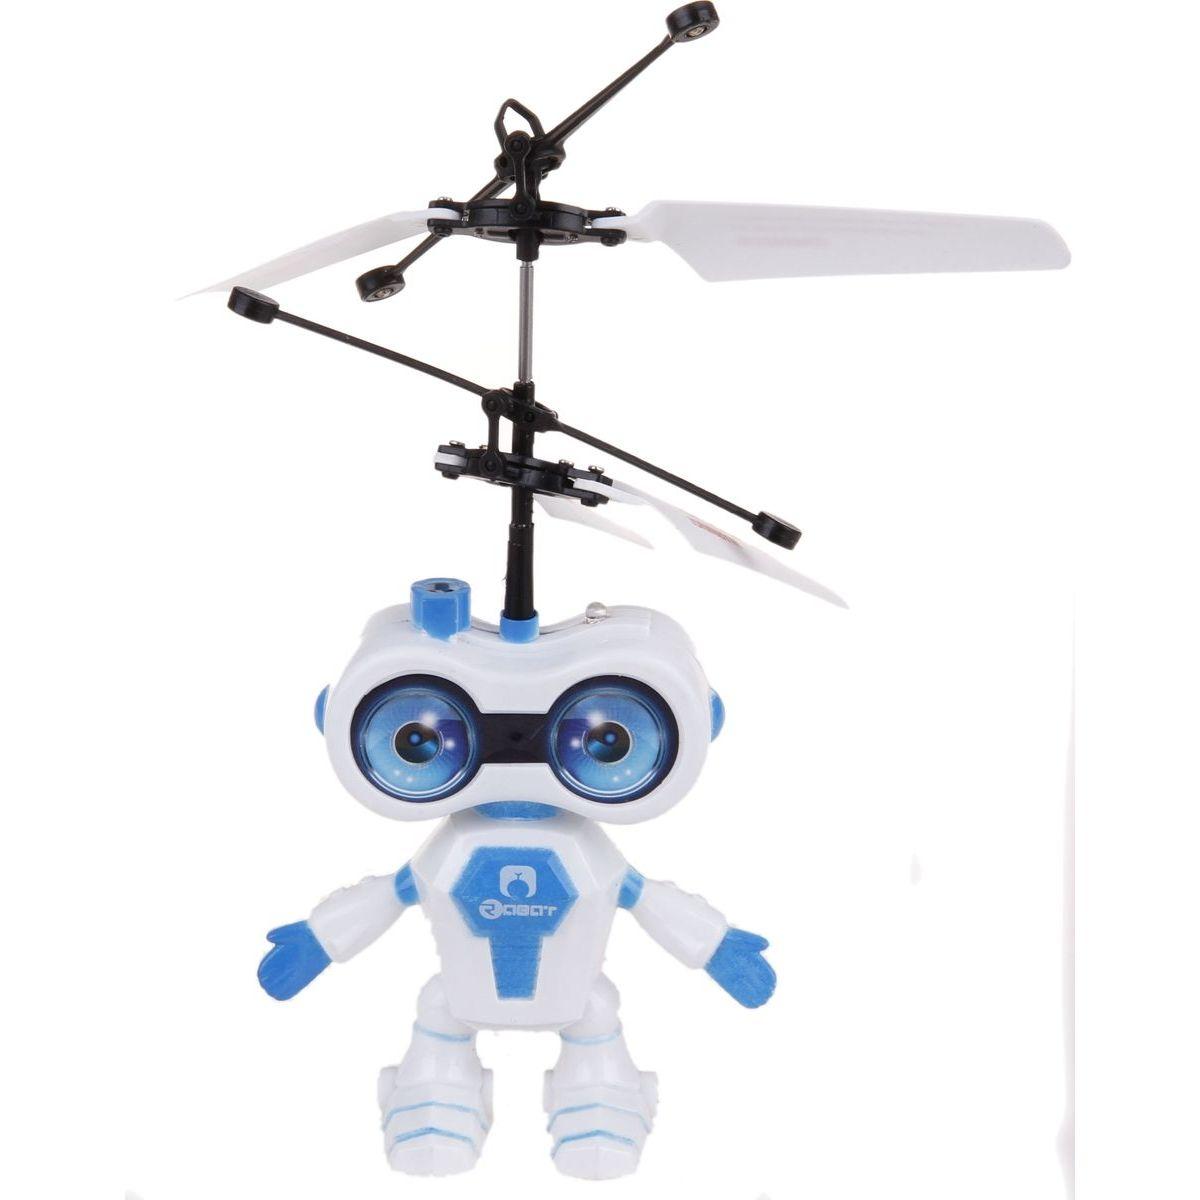 Teddies Vrtulník vesmírný letec 15cm se senzorem - Modrá